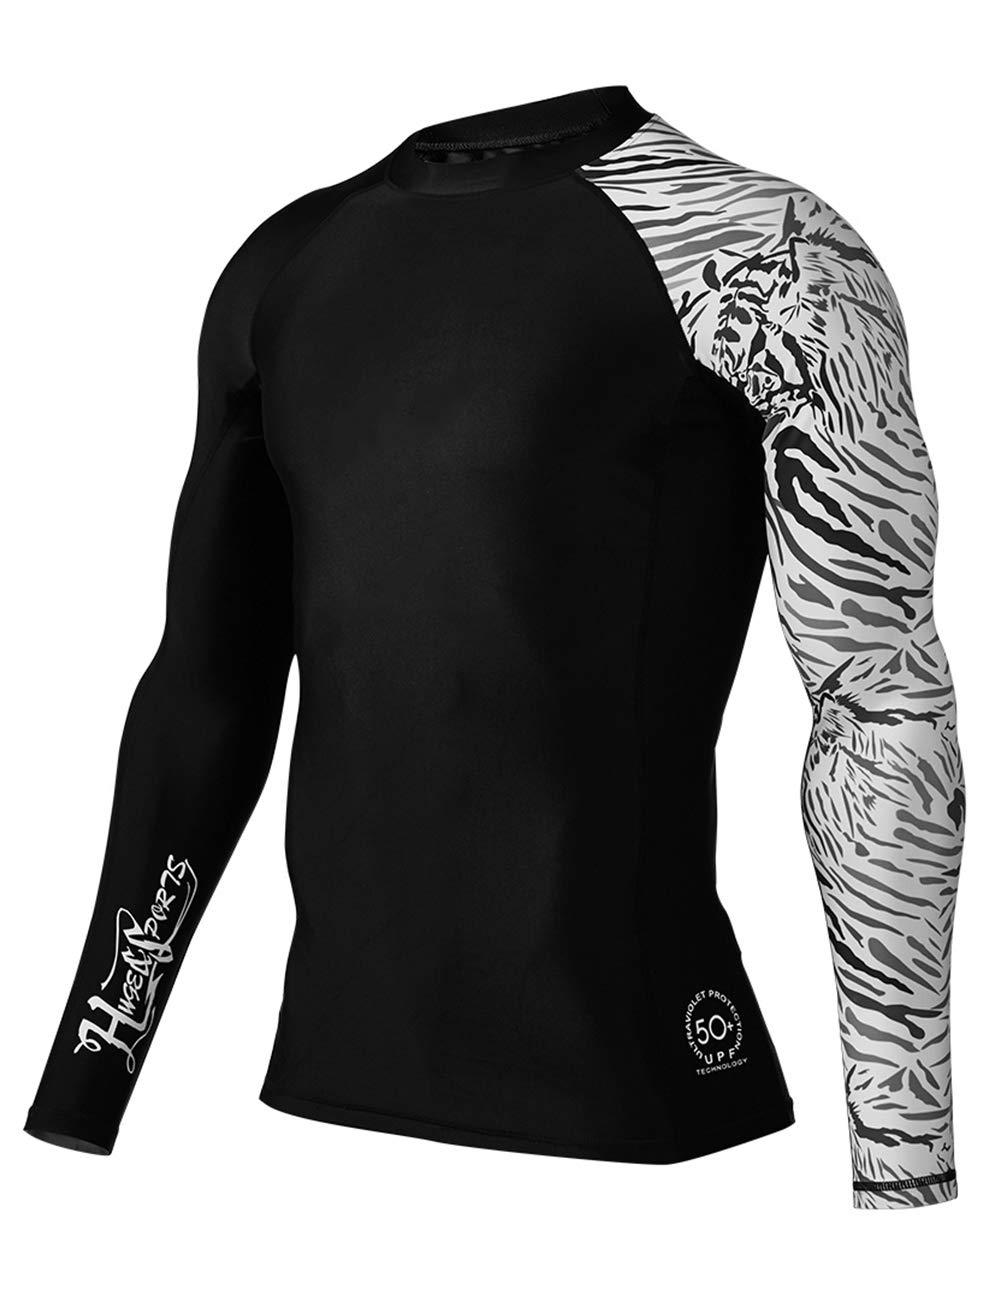 HUGE SPORTS Men's Splice UV Sun Protection UPF 50+ Skins Rash Guard Long Sleeves (Cow, L) by HUGE SPORTS